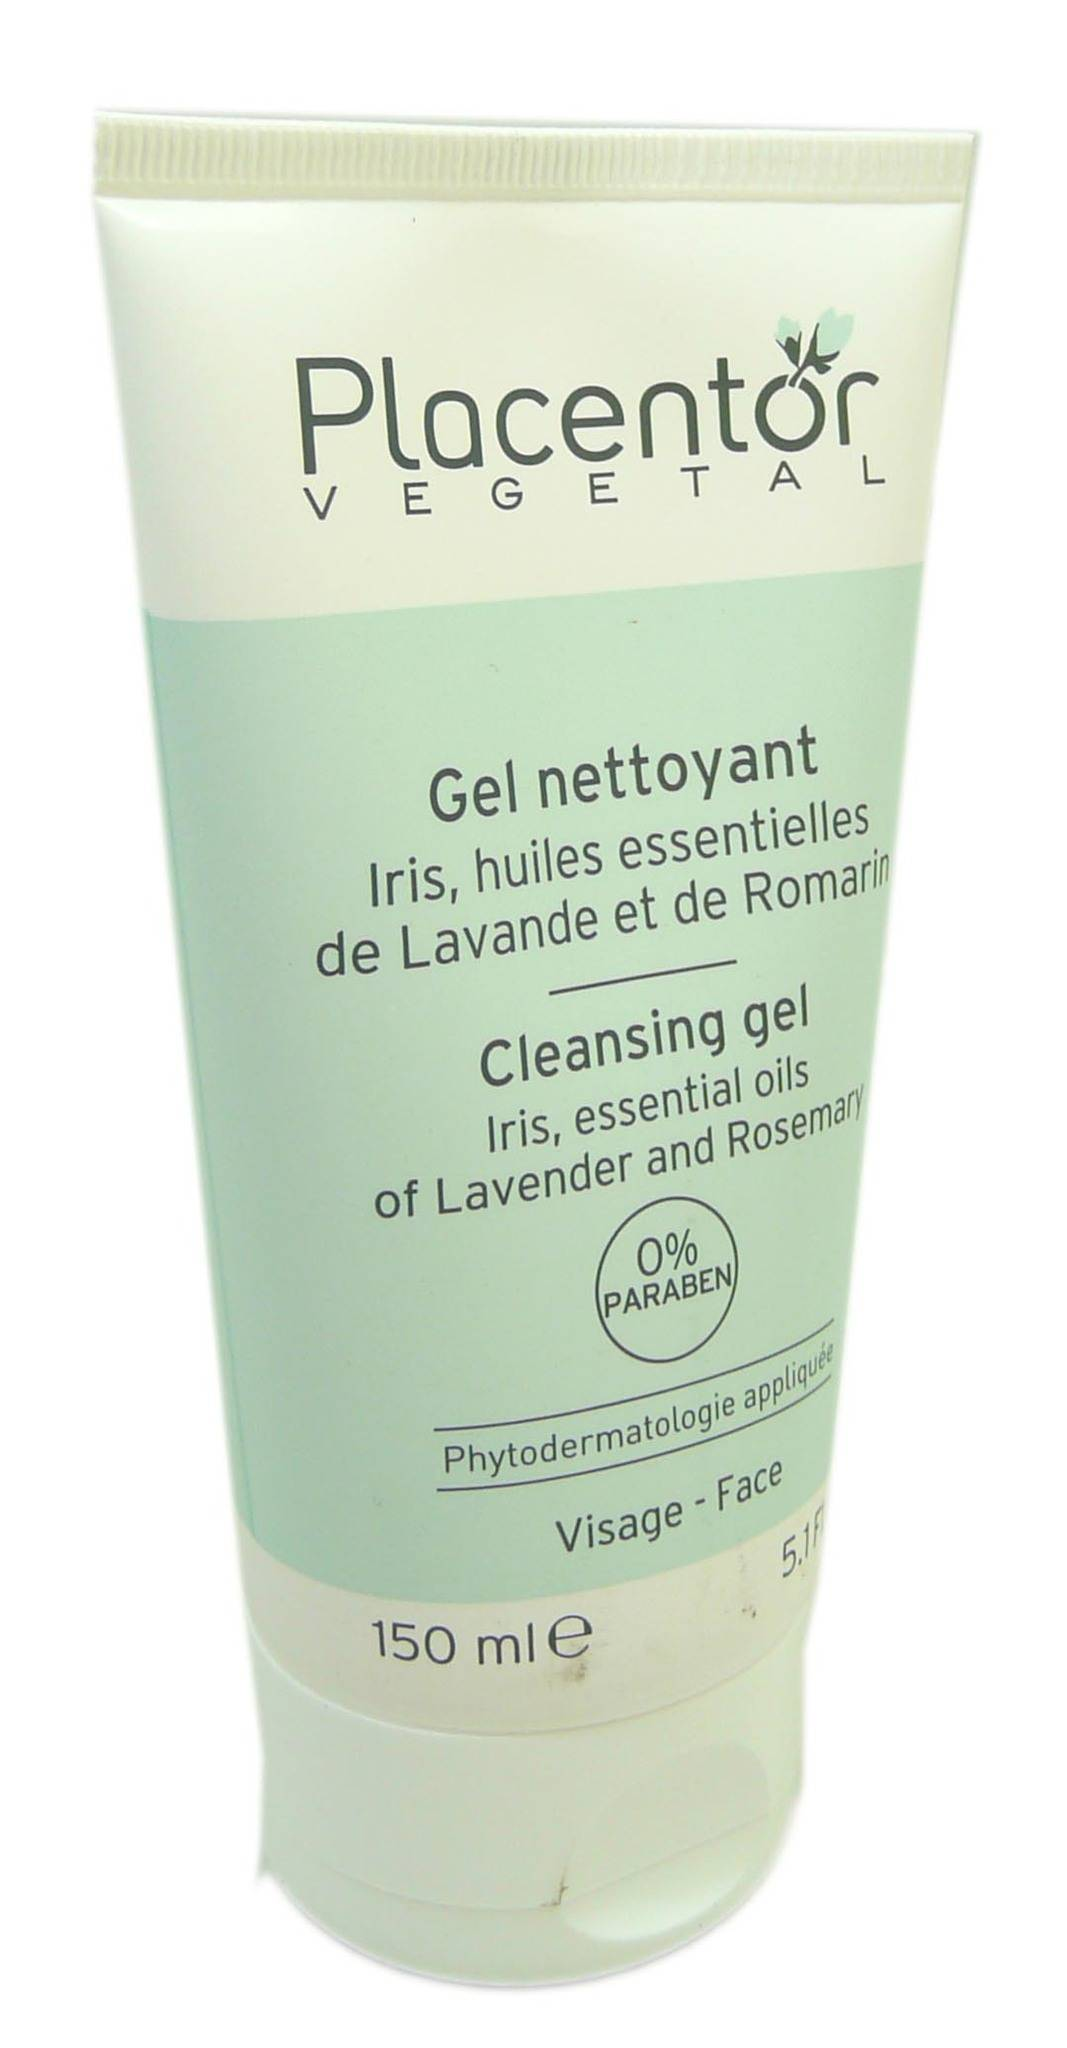 Placentor gel nettoyant visage 150ml